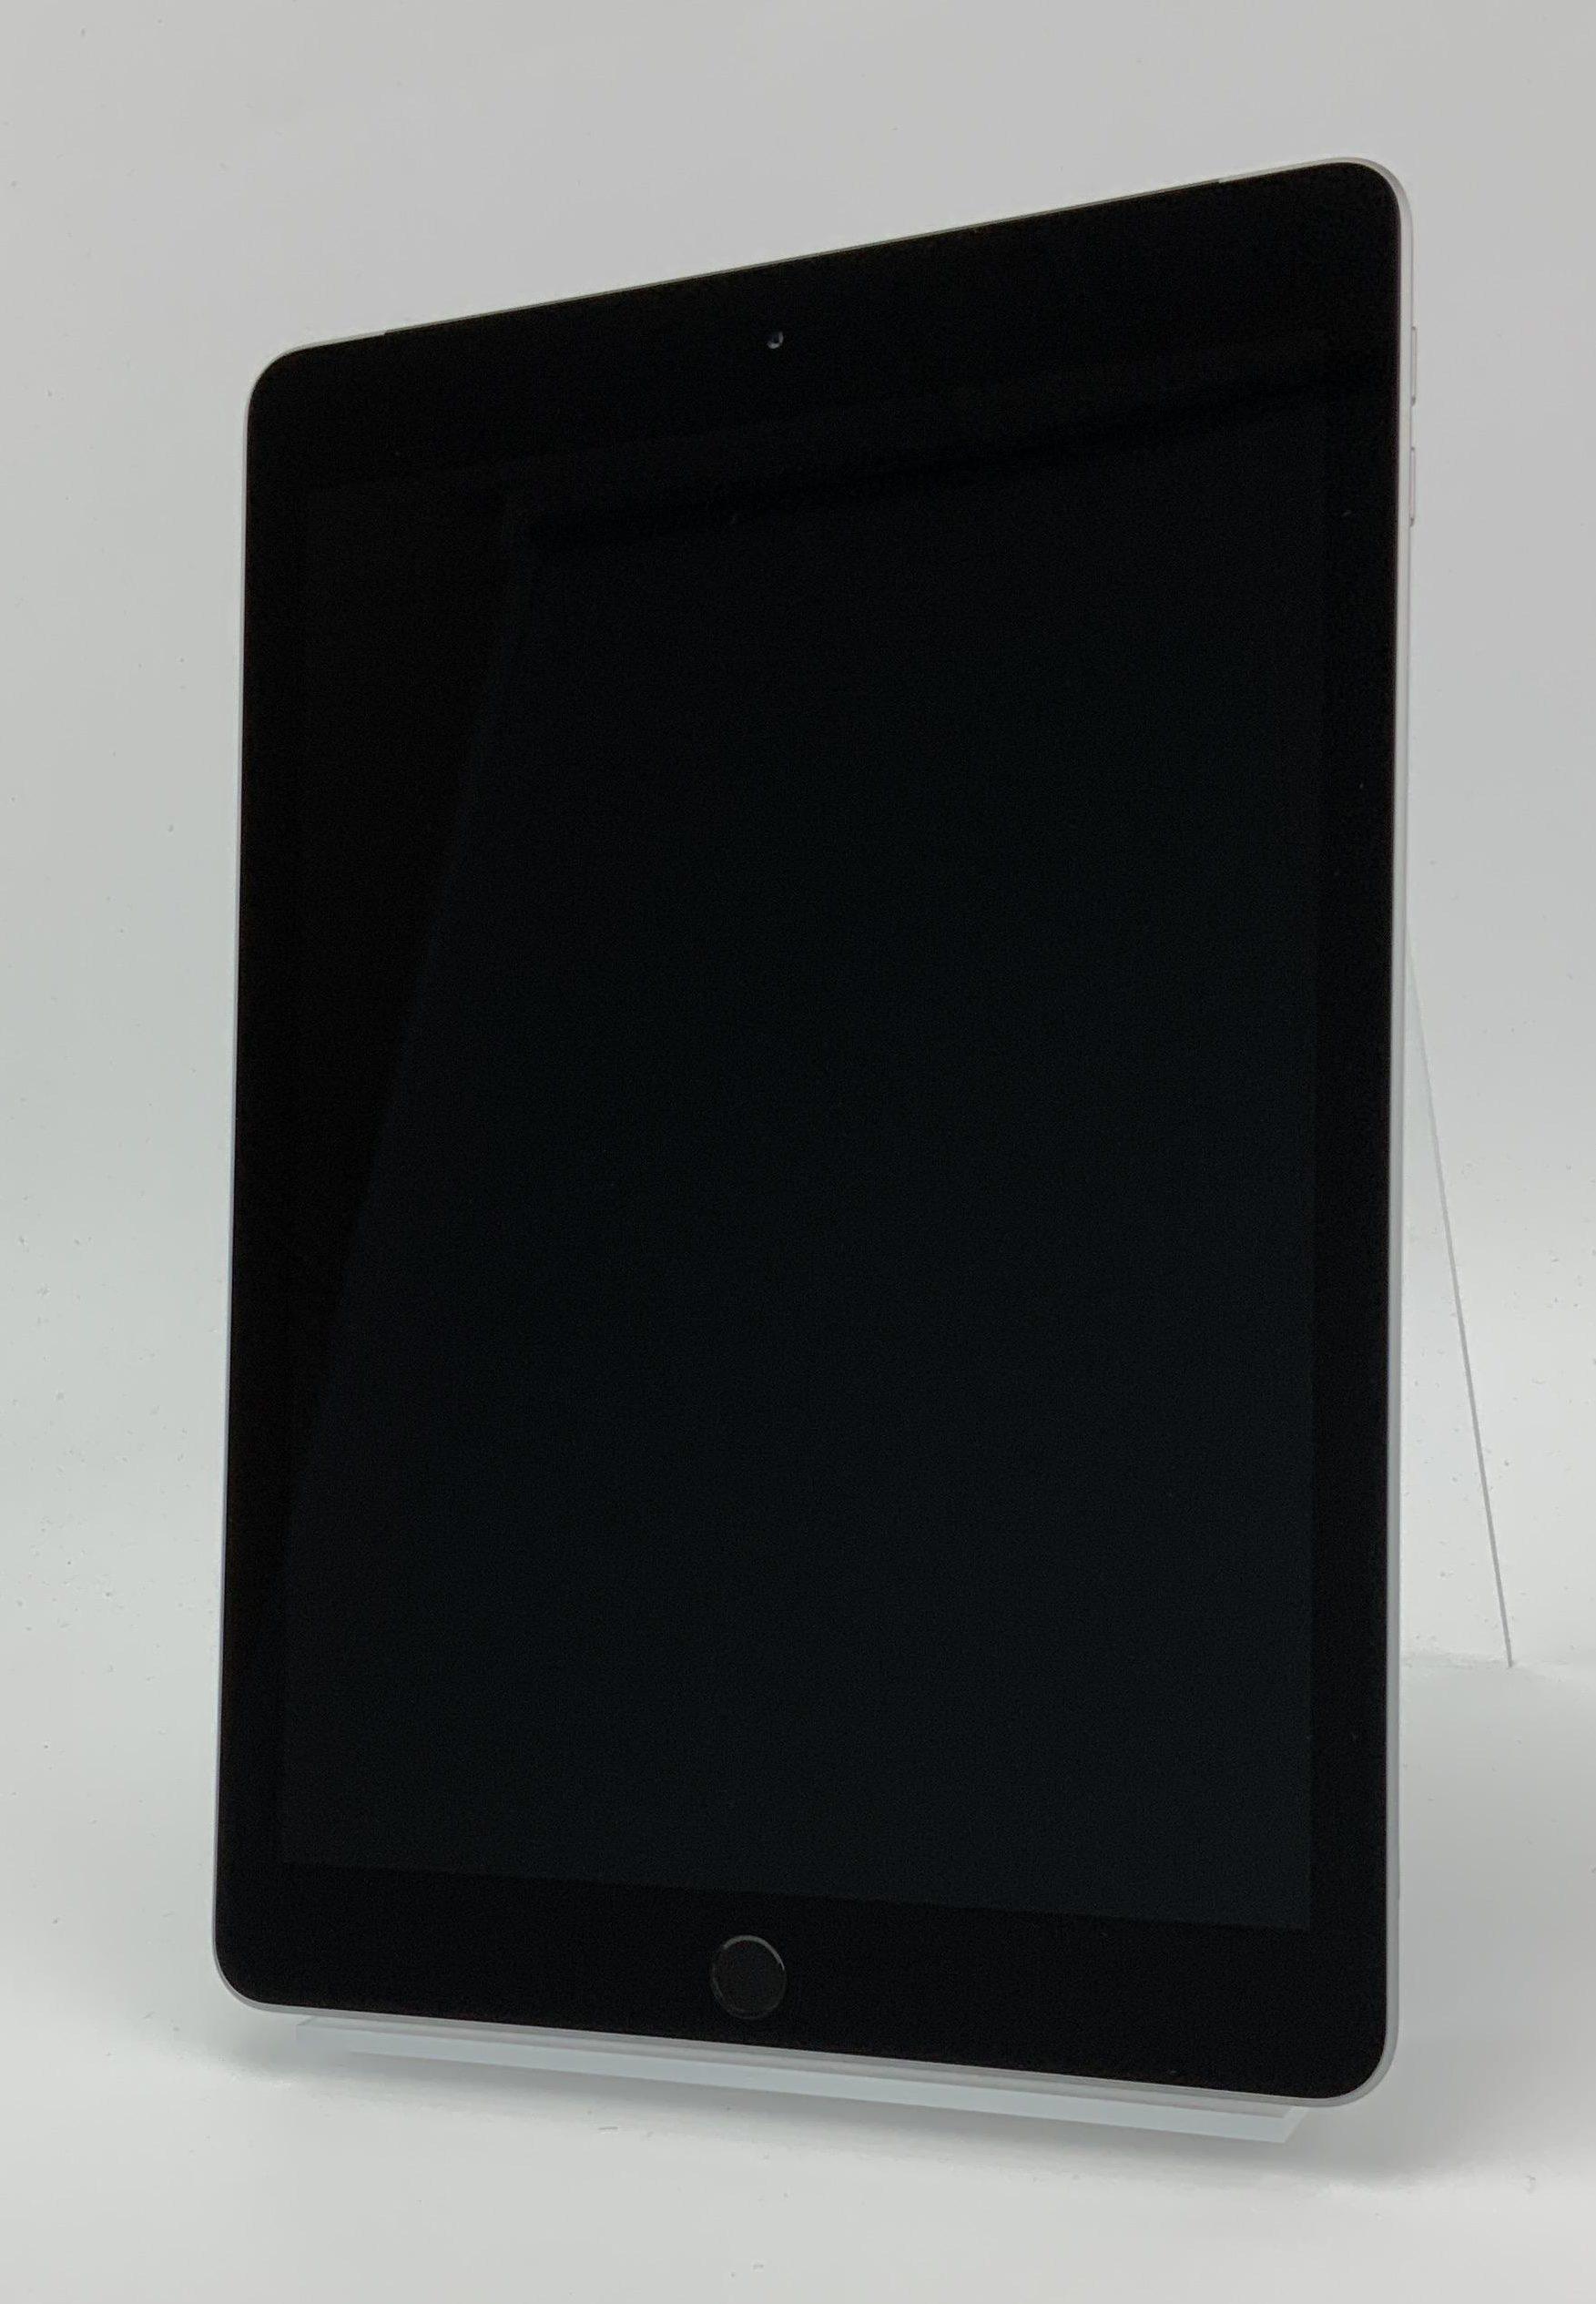 iPad 6 Wi-Fi + Cellular 128GB, 128GB, Space Gray, obraz 1